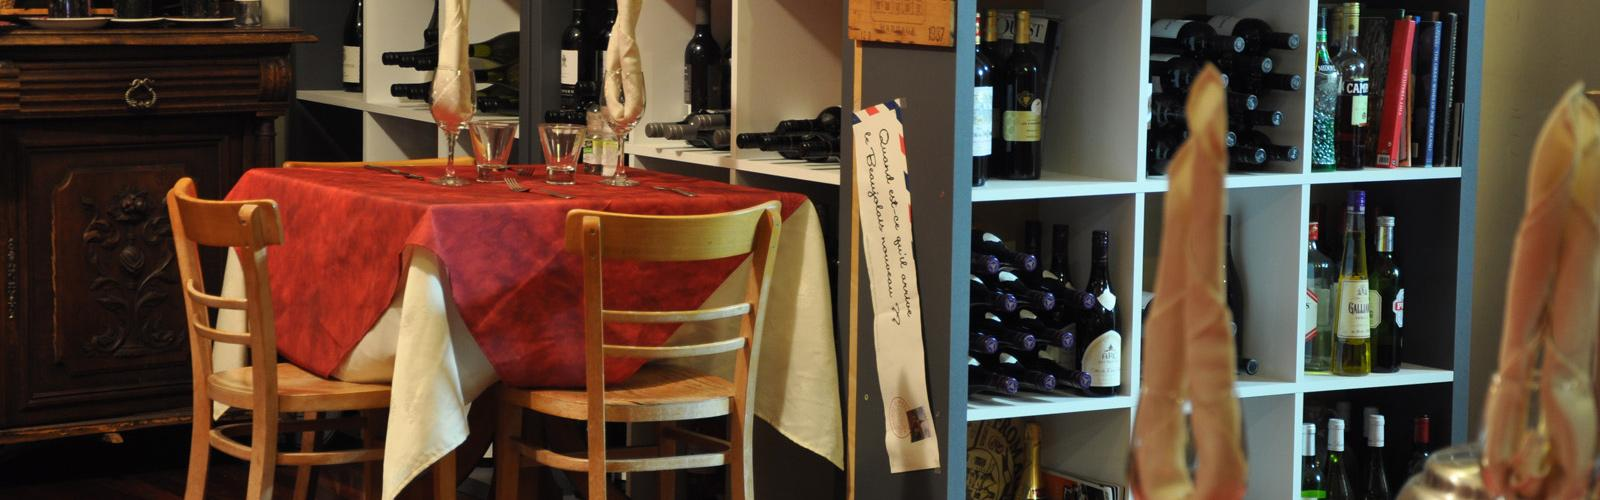 Cafe Versailles Licensed Restaurant